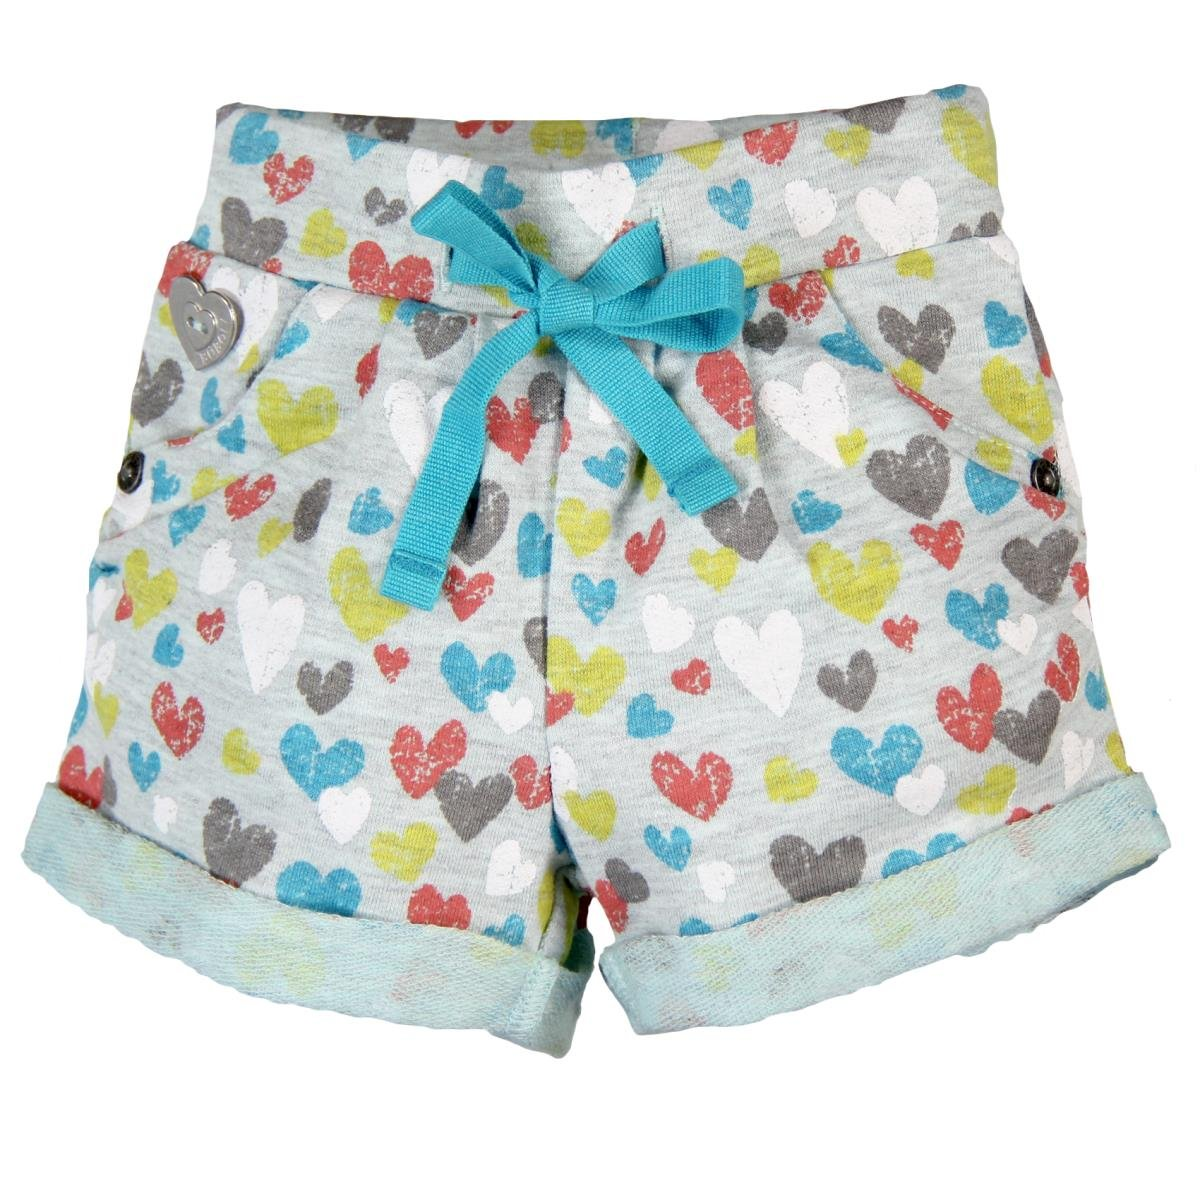 boboli Fleece for Baby Girl, Short Bébé Fille Multicolore (Print) 24 Mois Bóboli 223074